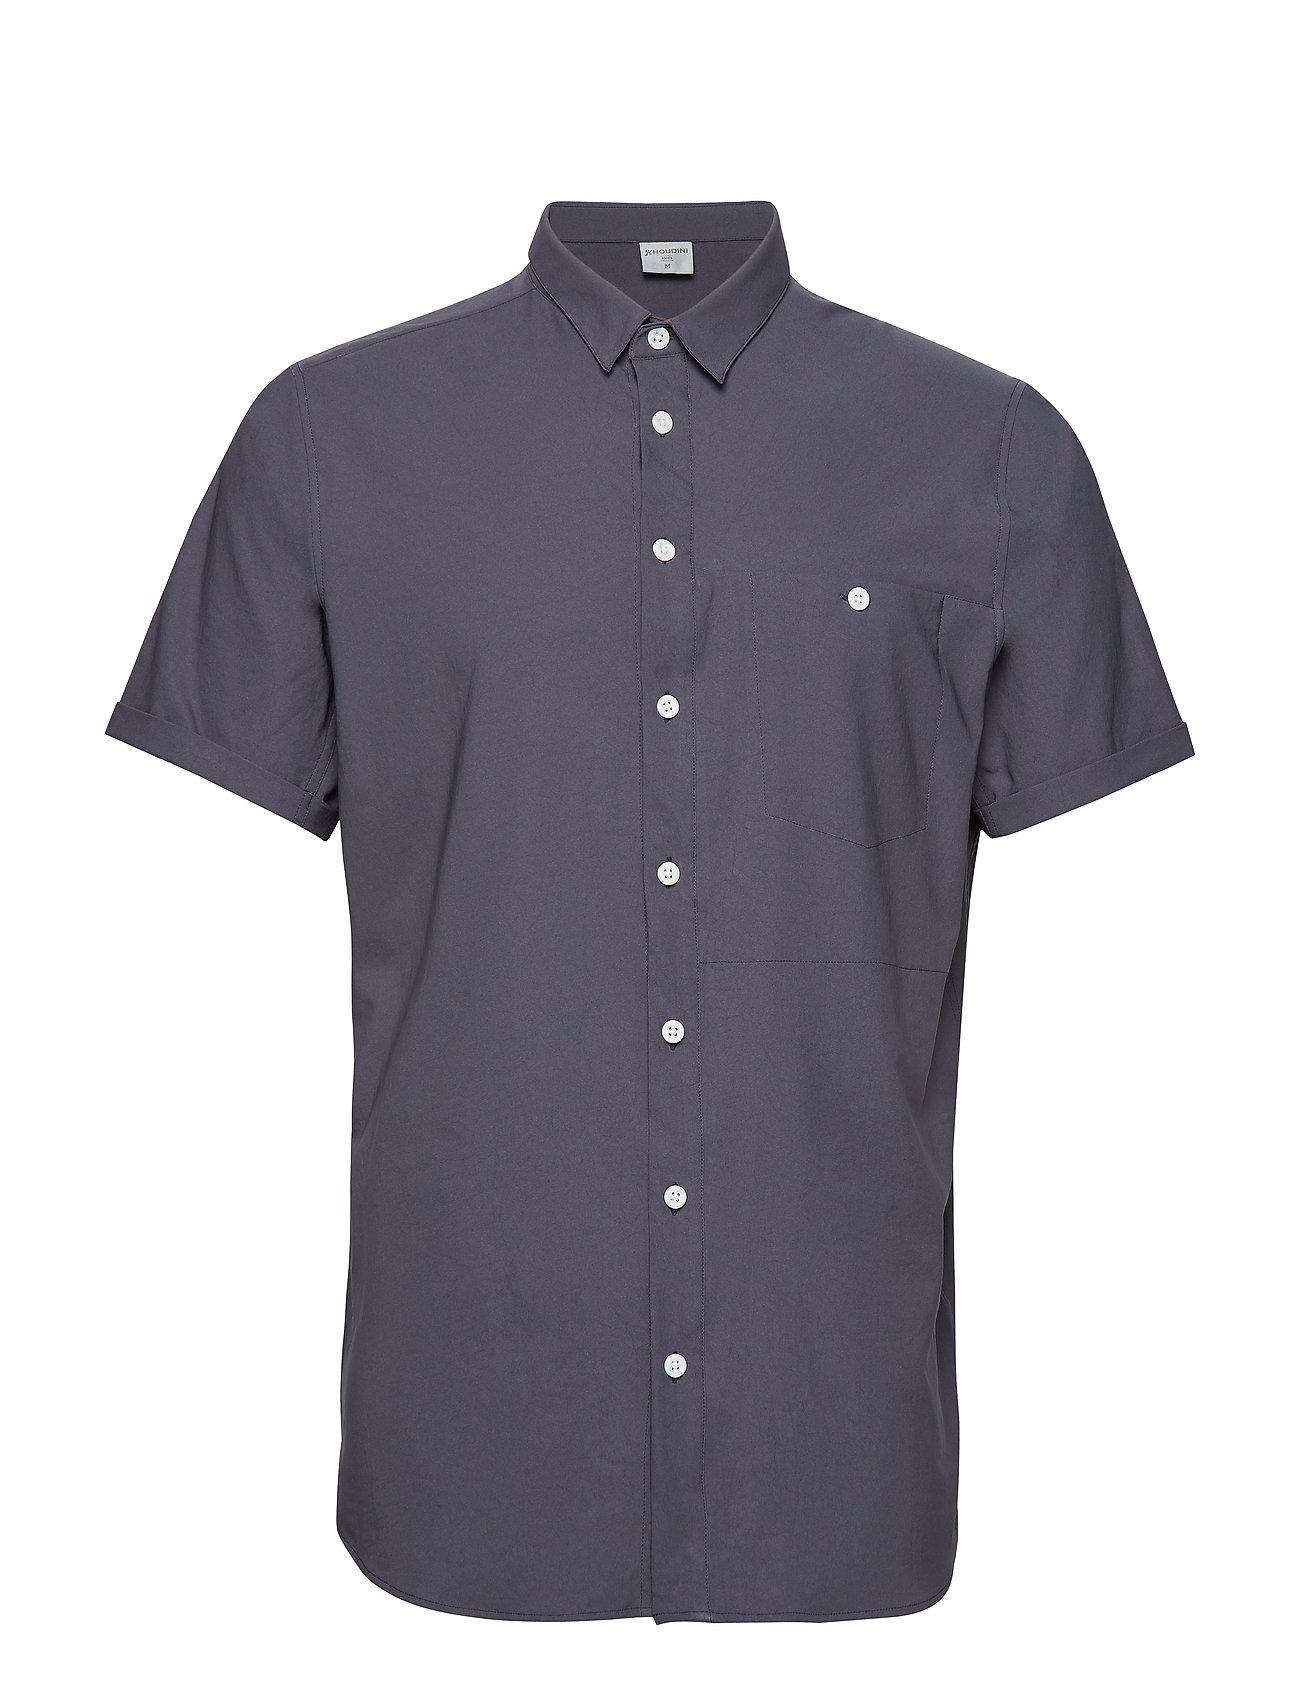 Houdini M's Shortsleeve Shirt - BIG BANG BLUE